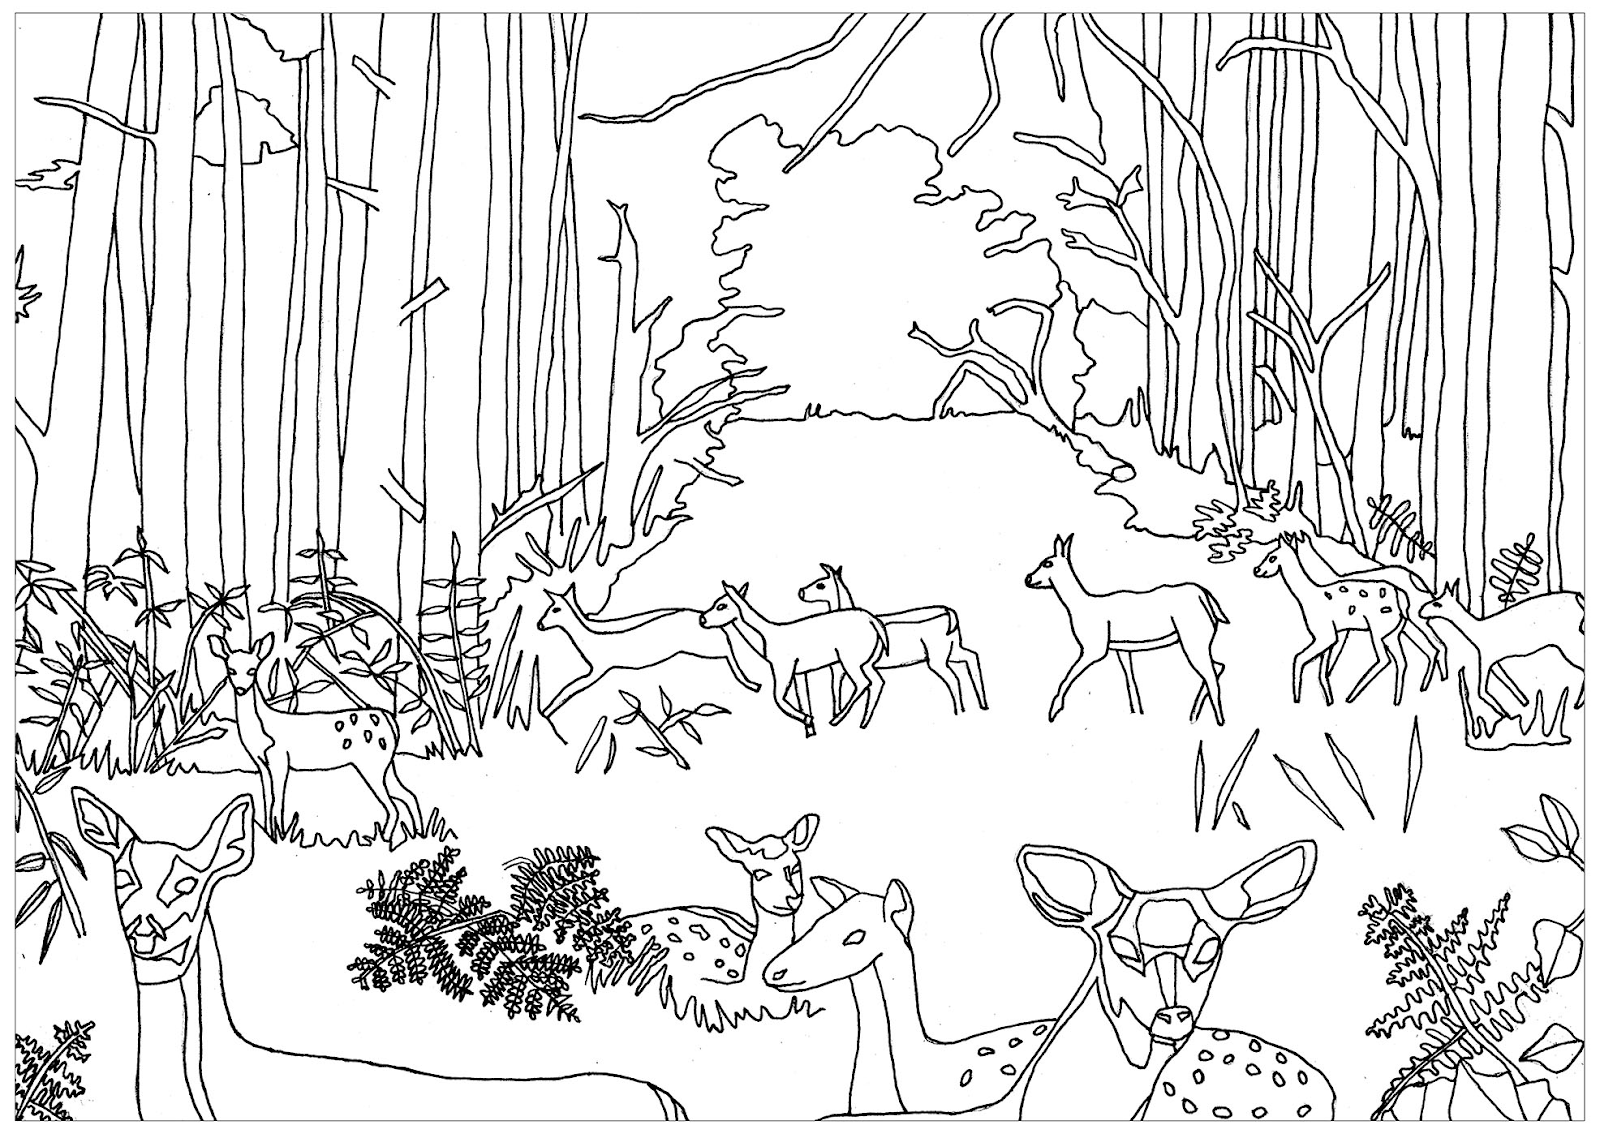 Sketsa Gambar Mewarnai Pemandangan Hutan Hitam Putih Terbaru